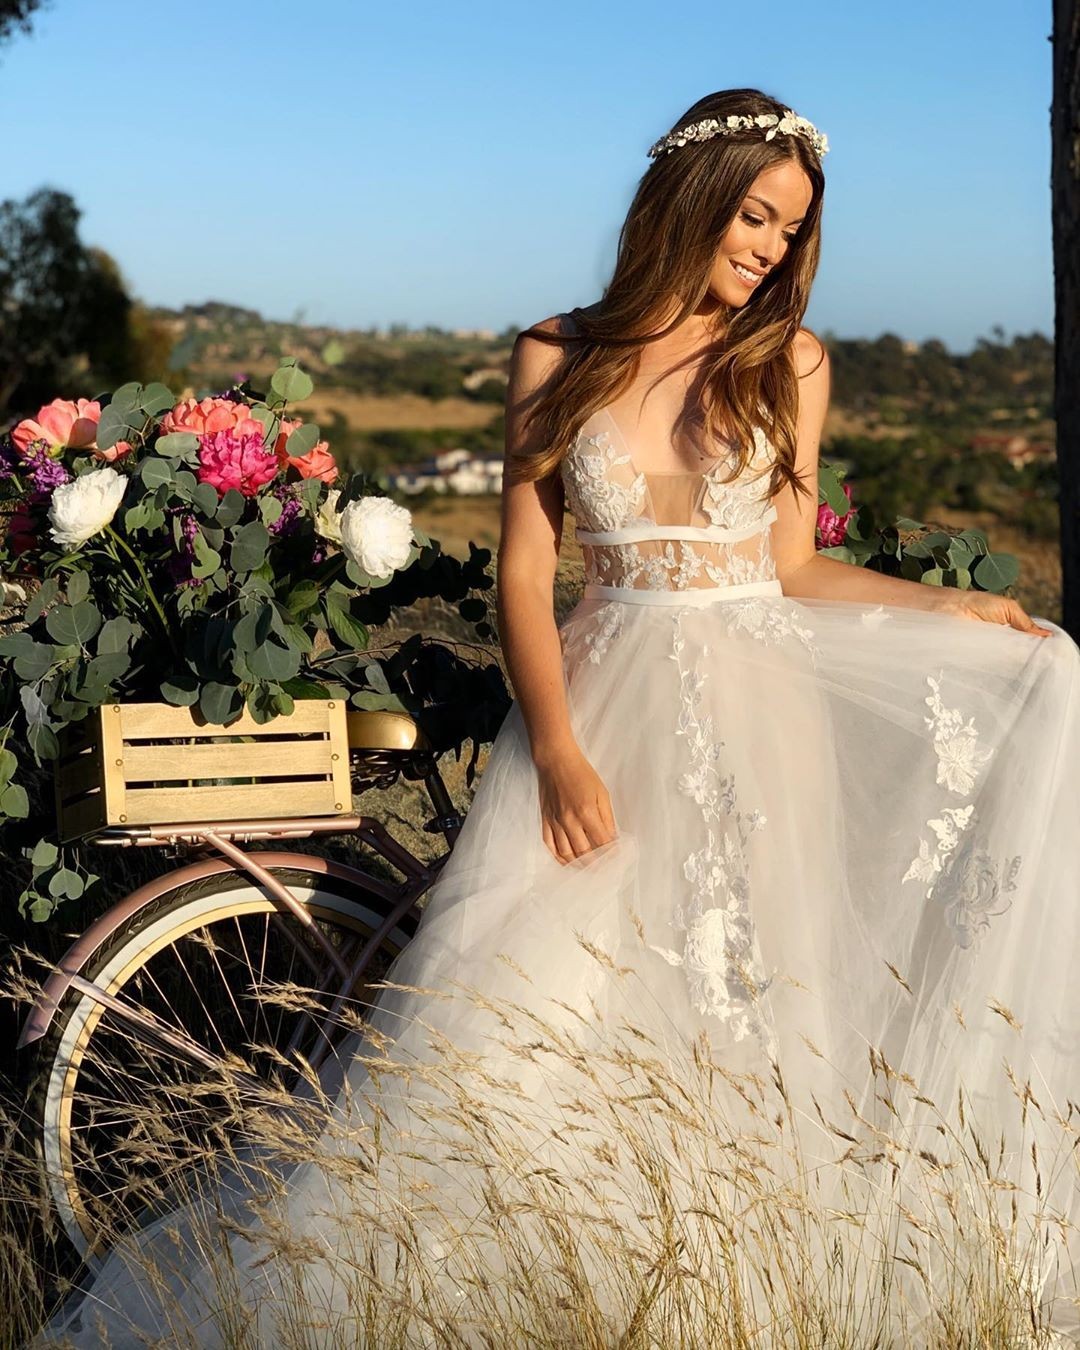 marisa butler, top 30 de miss world 2018/miss earth maine 2020. - Página 6 10096310